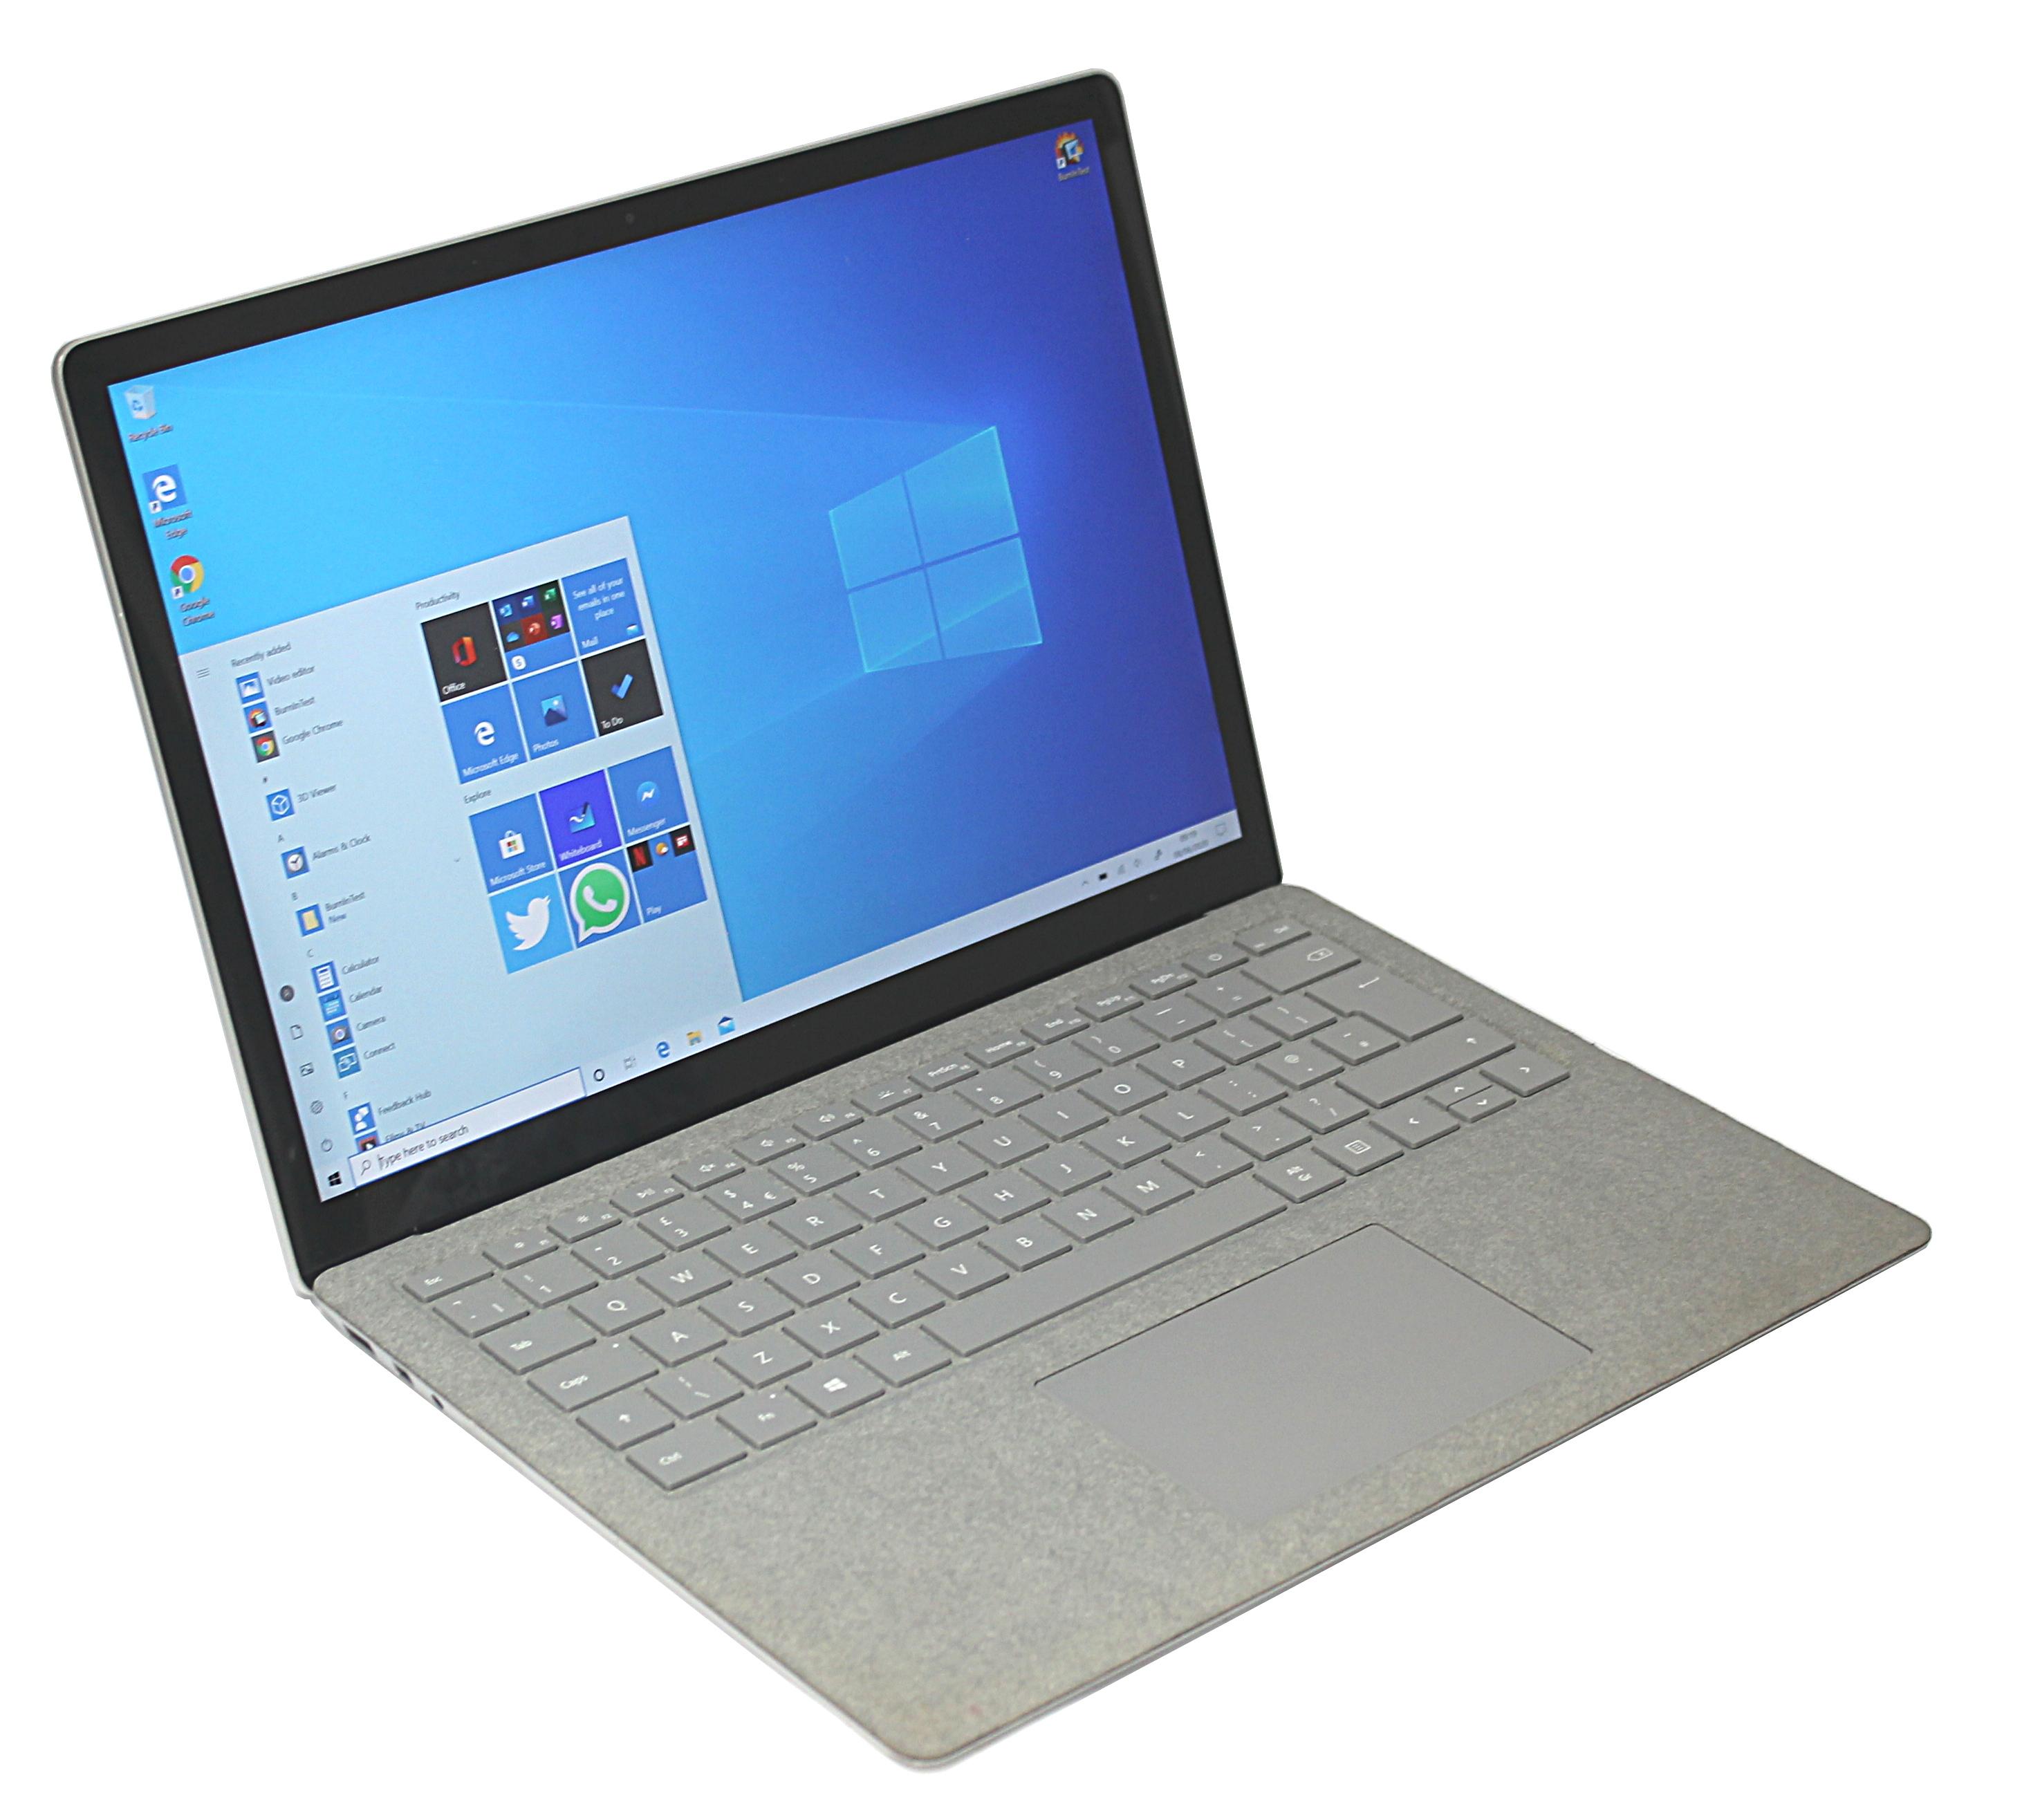 Microsoft Surface Laptop 2 - M1769 i5-8250U 8GB RAM 256GB eMMC Windows 10 Home